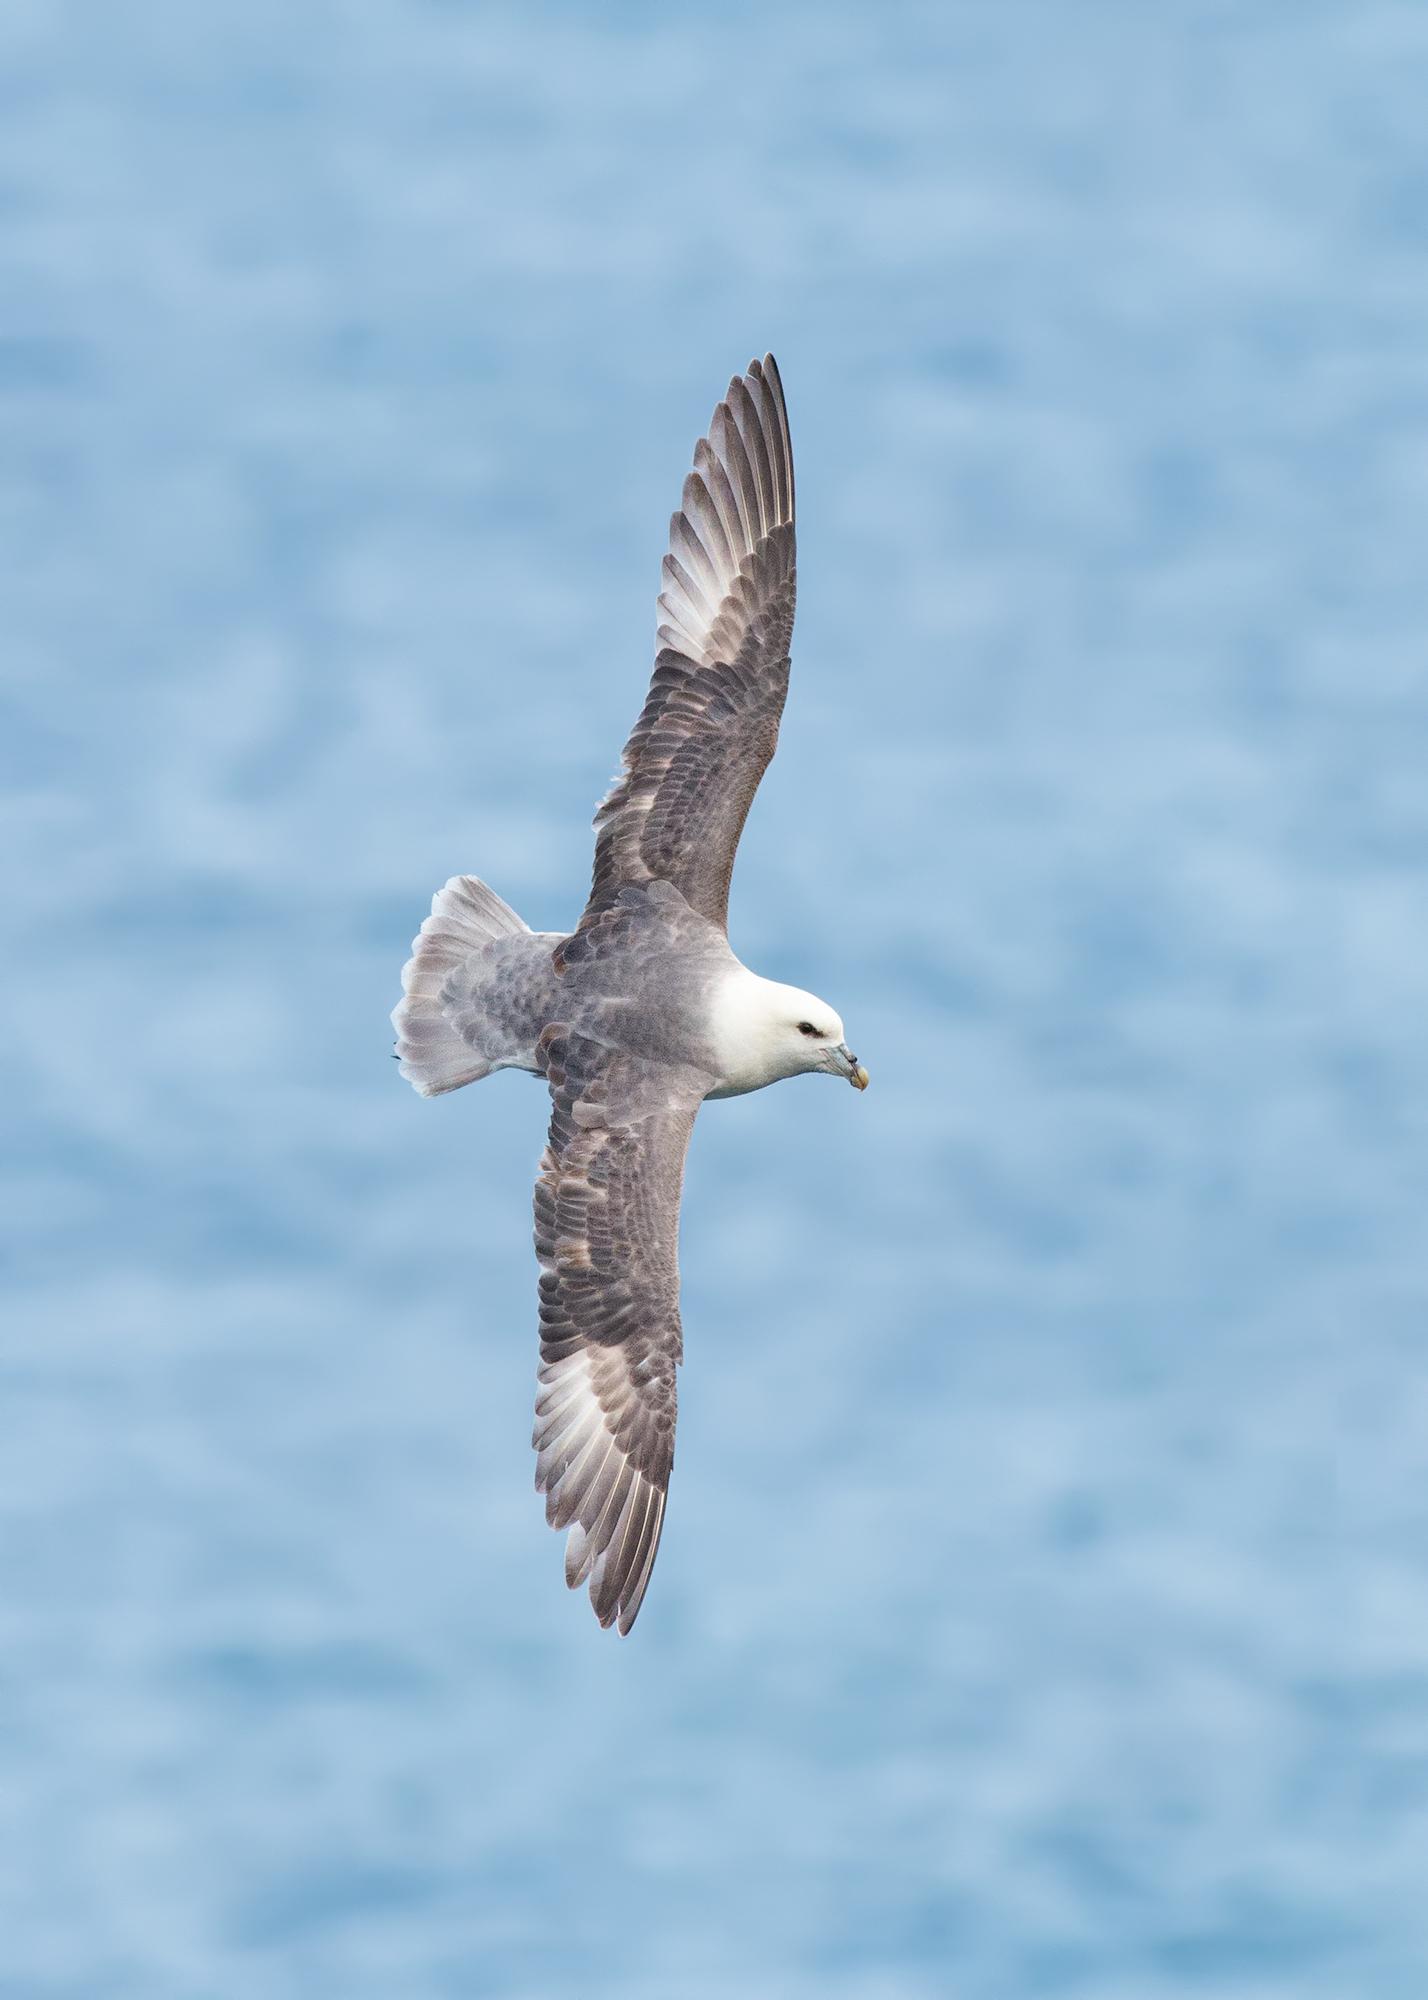 Stormfågel-JPEG_web 4.jpg